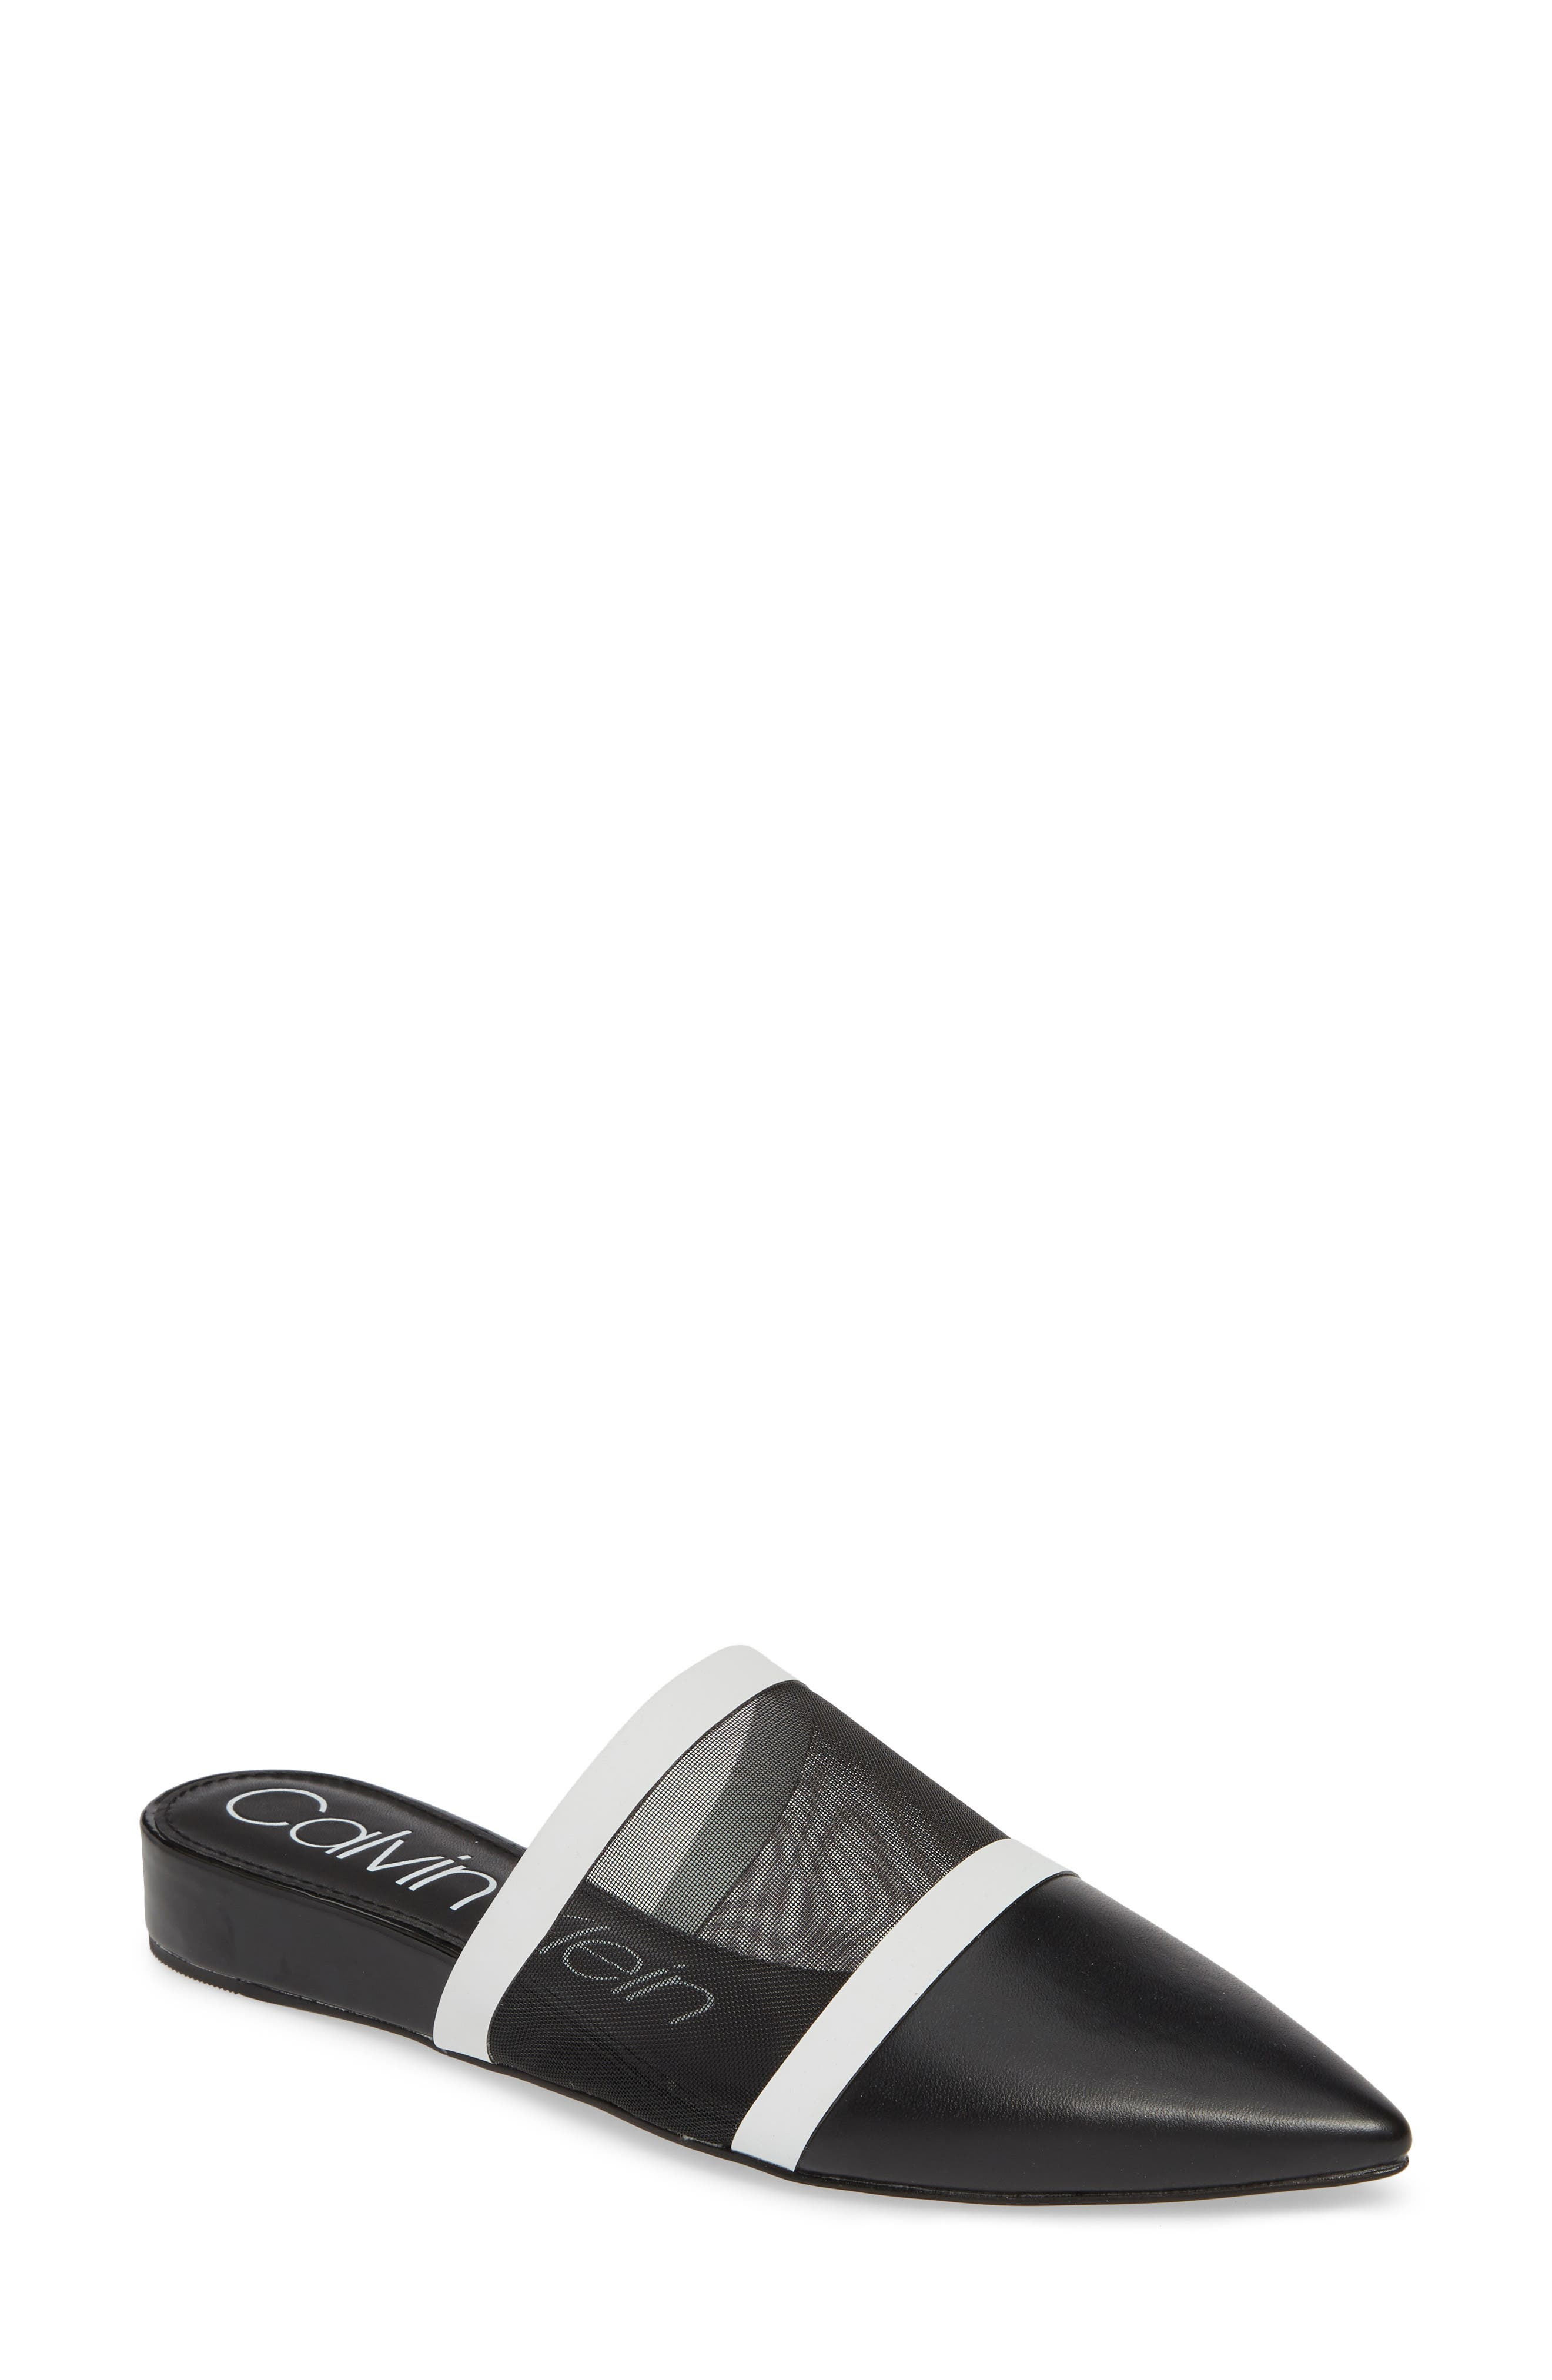 Calvin Klein Cardy Mesh Mule- Grey